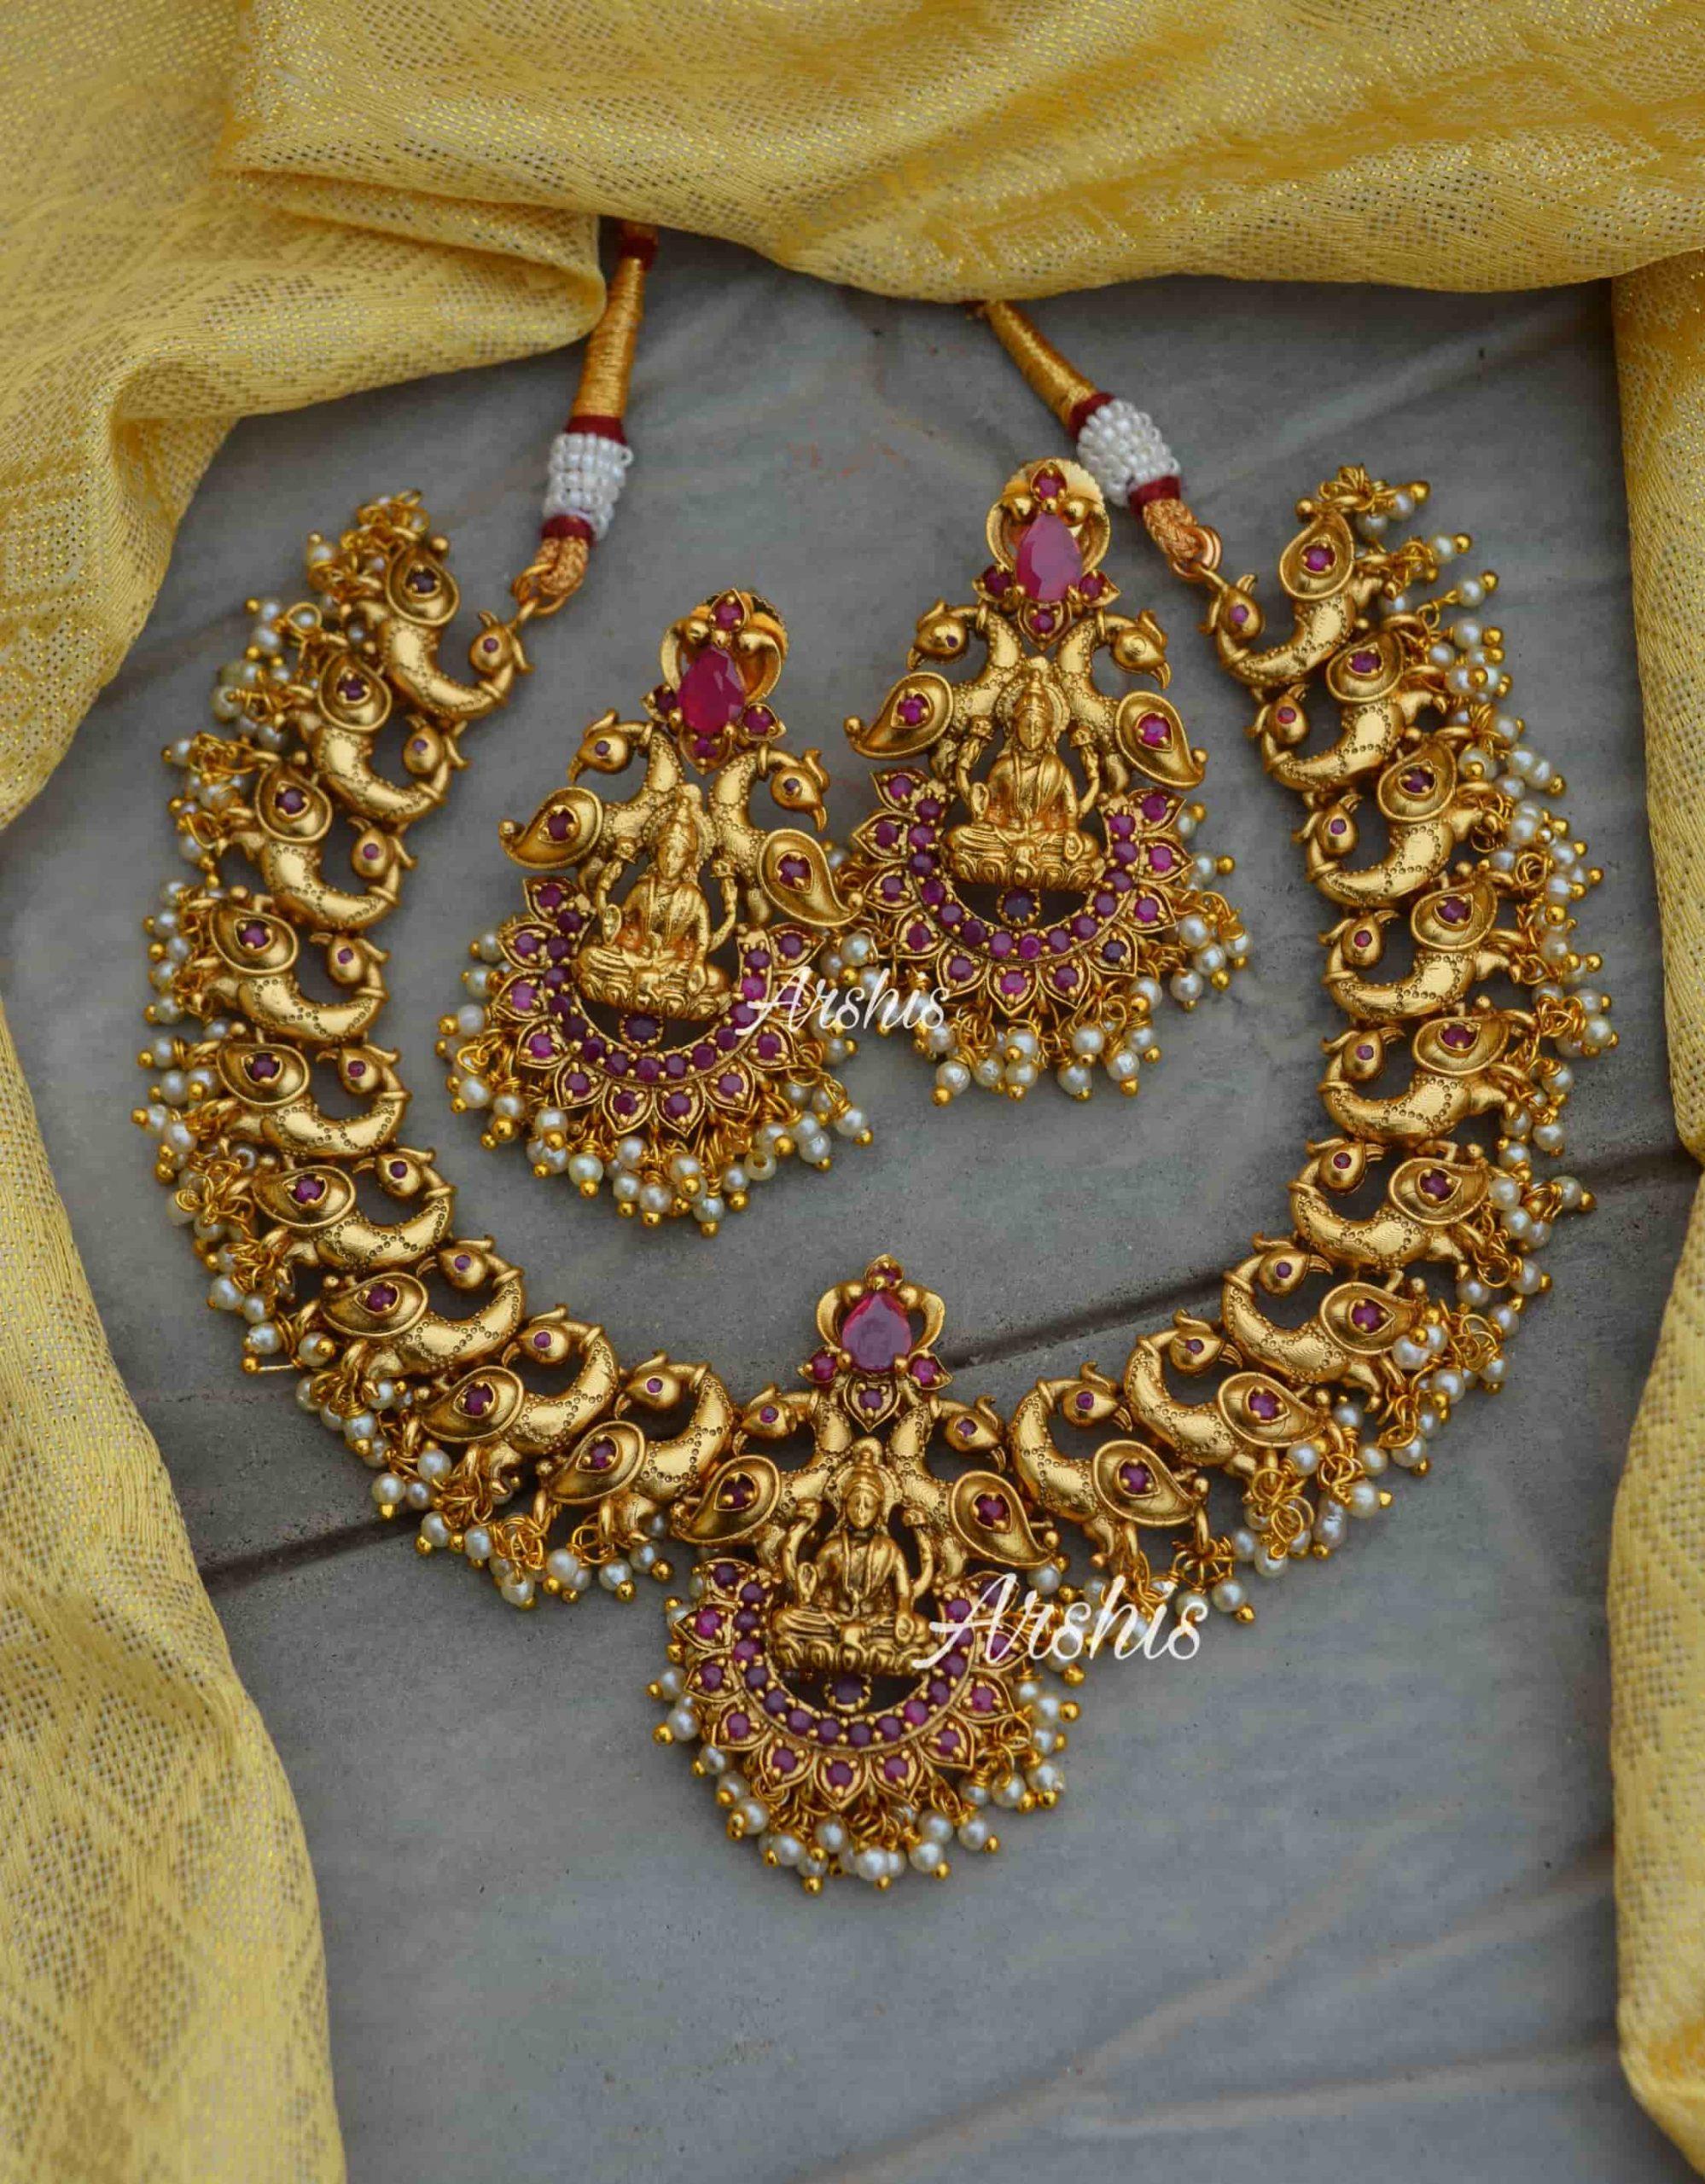 kemp-stone-peacock-design-lakshmi-pendant-necklace